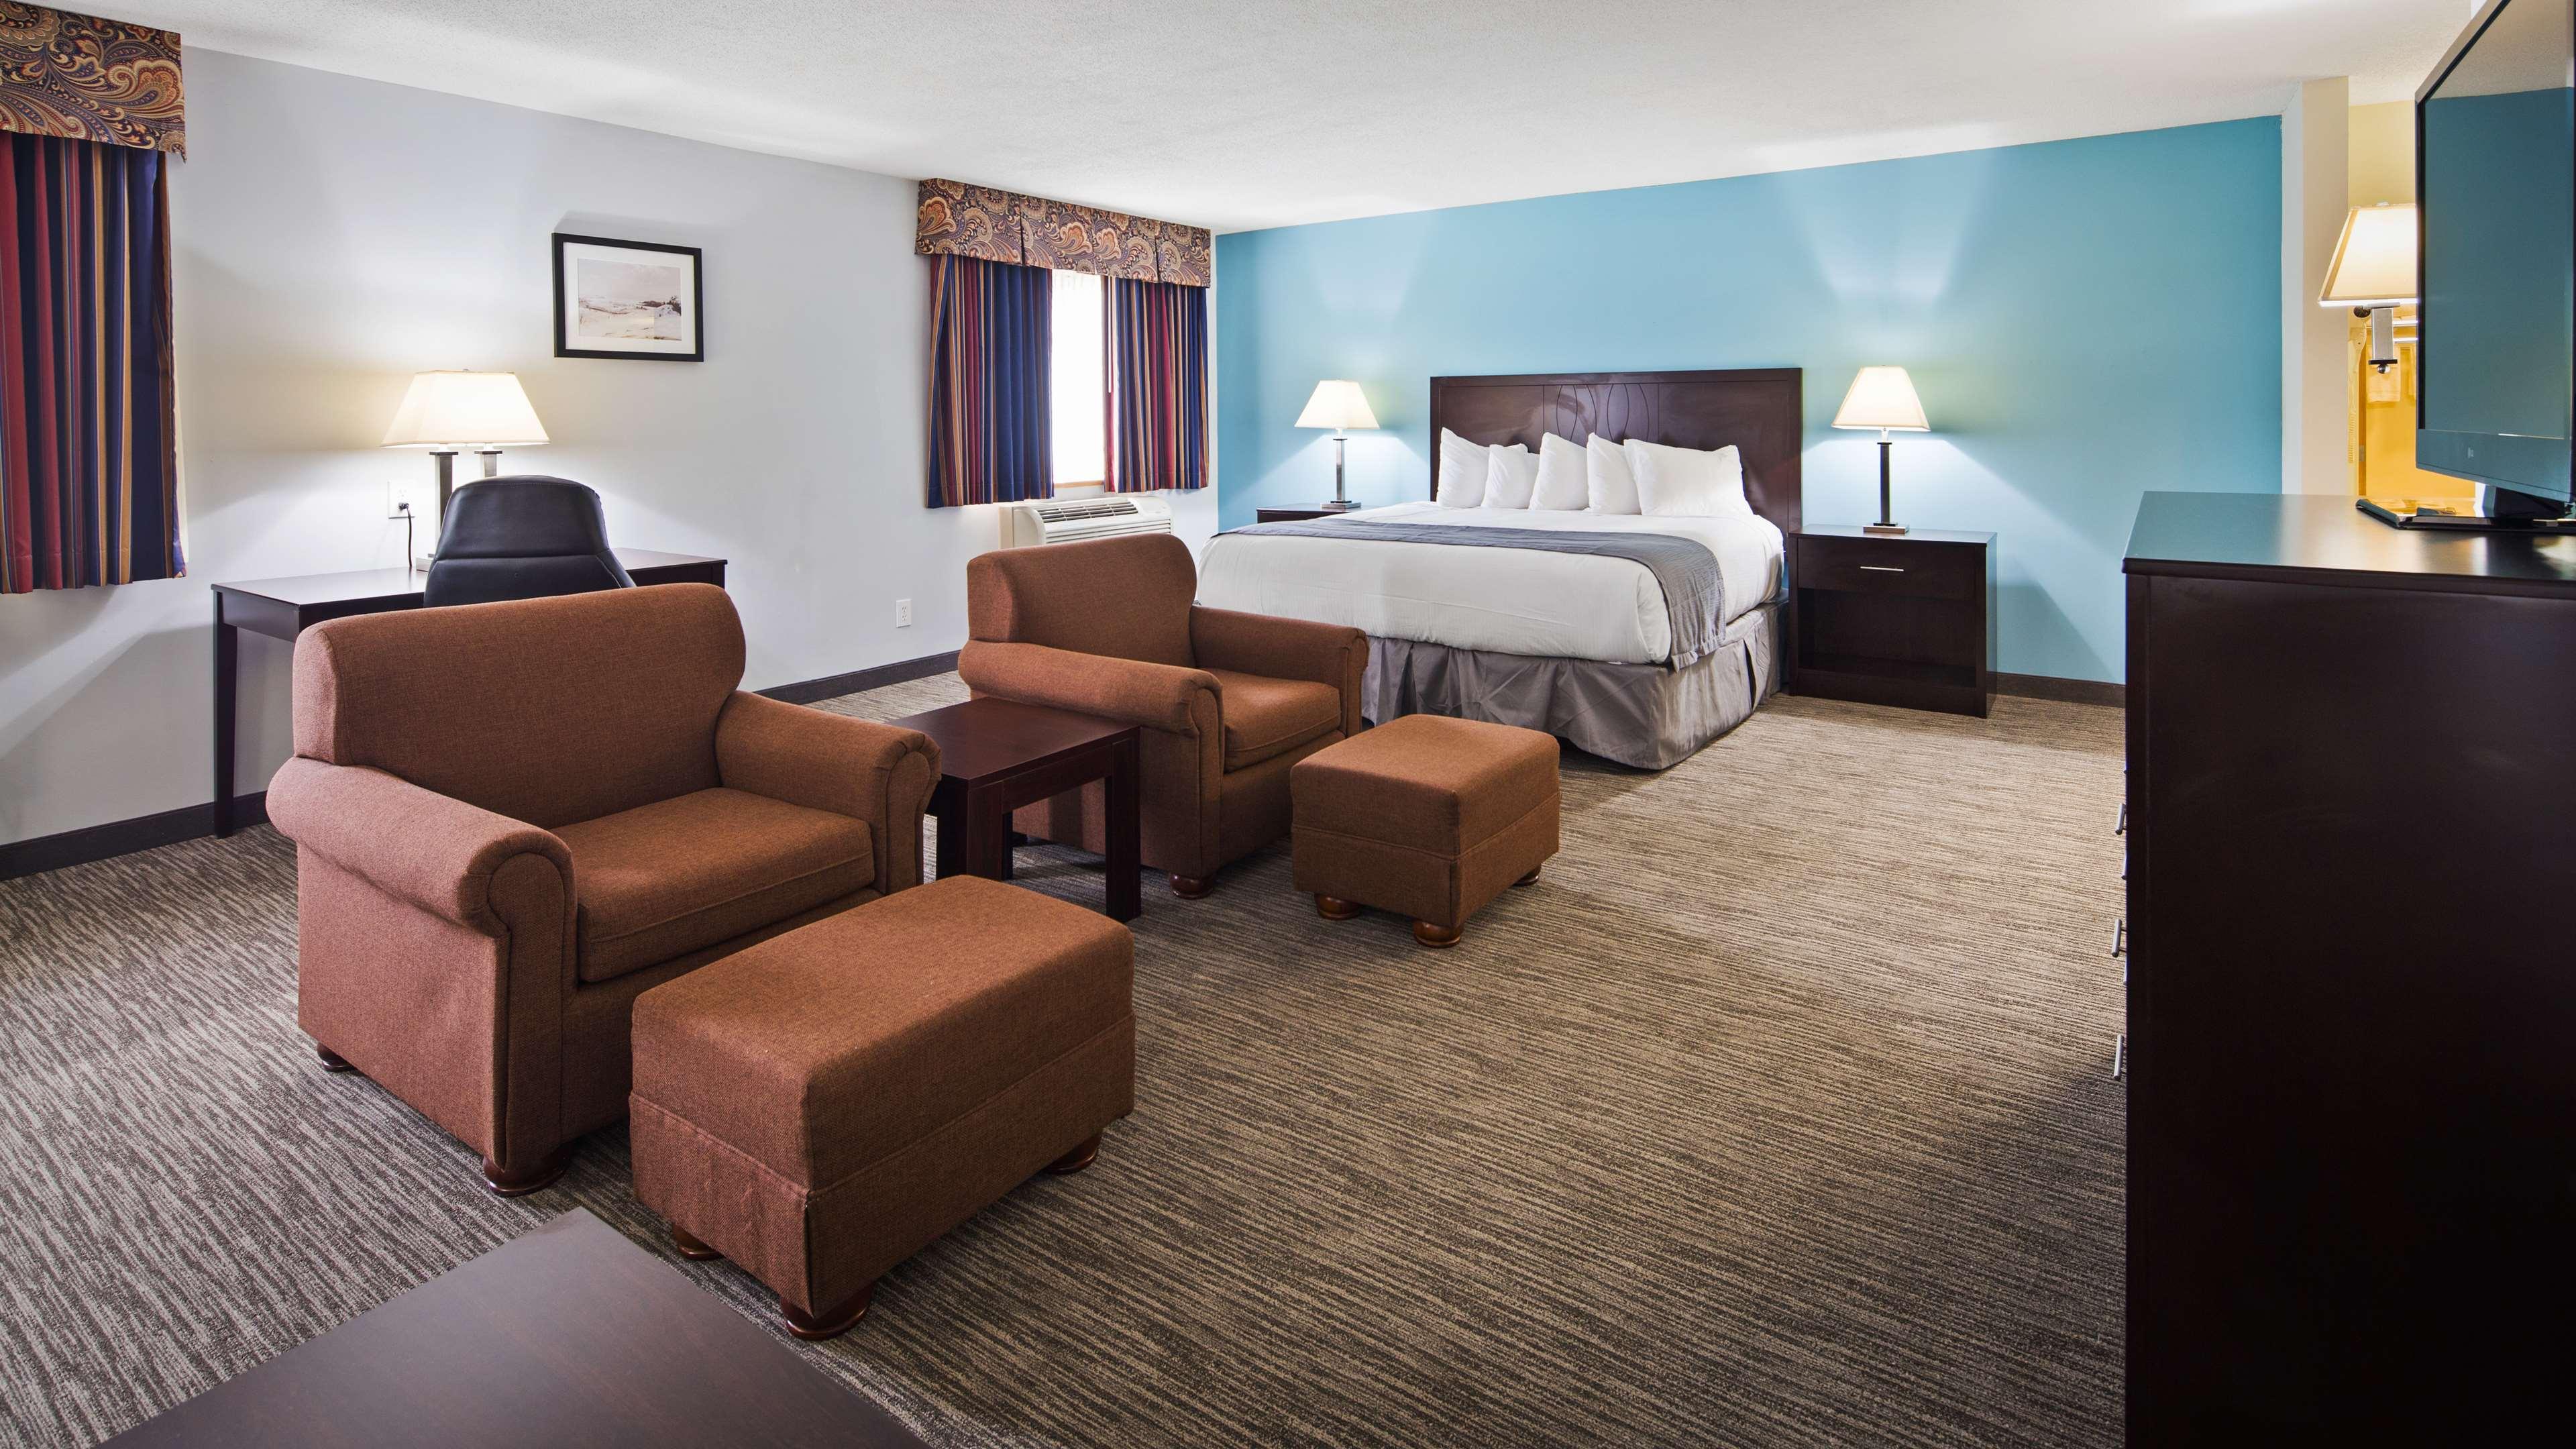 Best Western New Baltimore Inn image 24